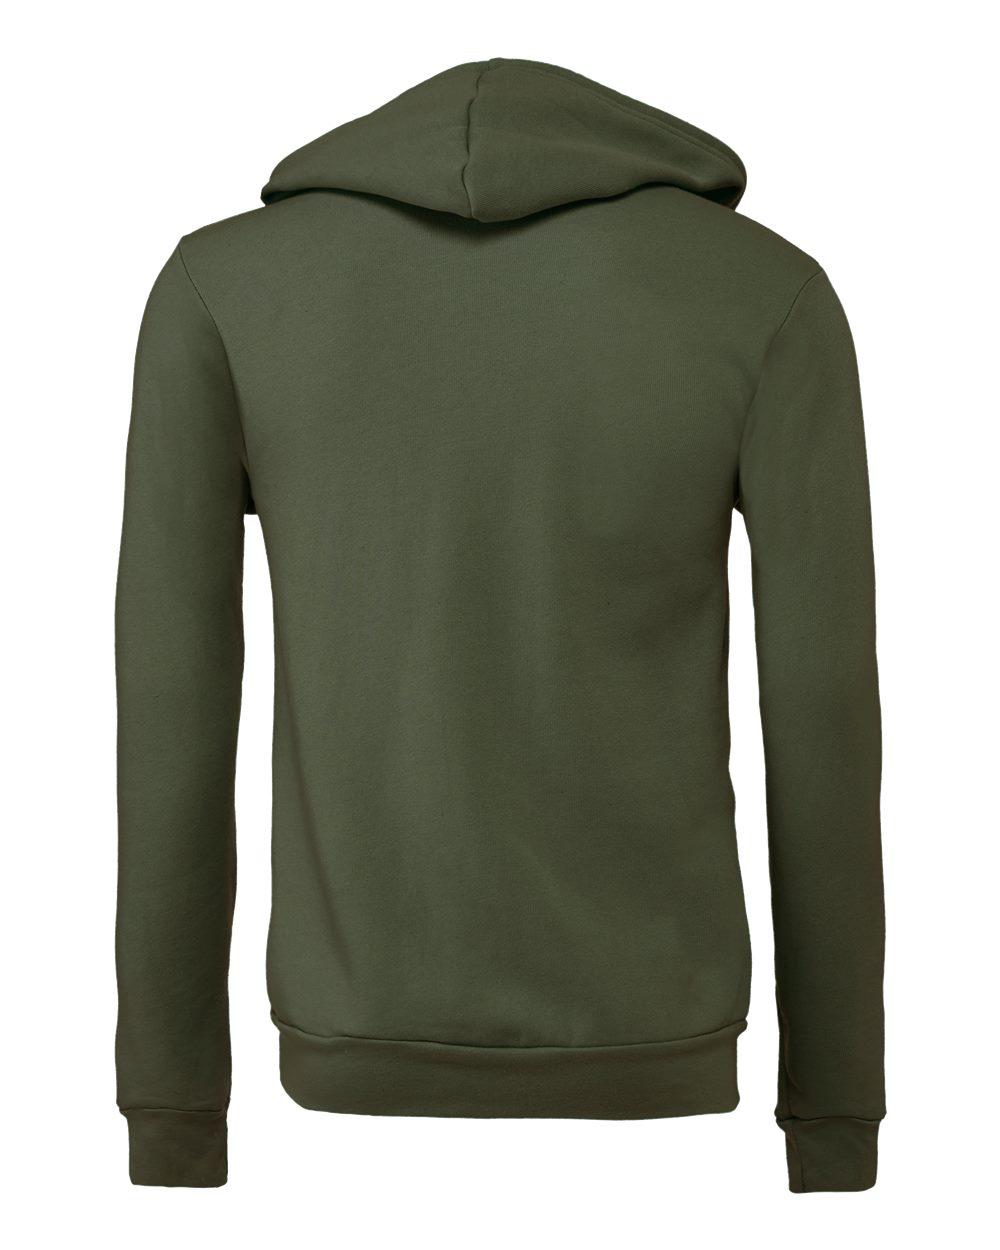 Bella-Canvas-Unisex-Full-Zip-Up-Hooded-Sweatshirt-Blank-Hoodie-3739-up-to-3XL thumbnail 72